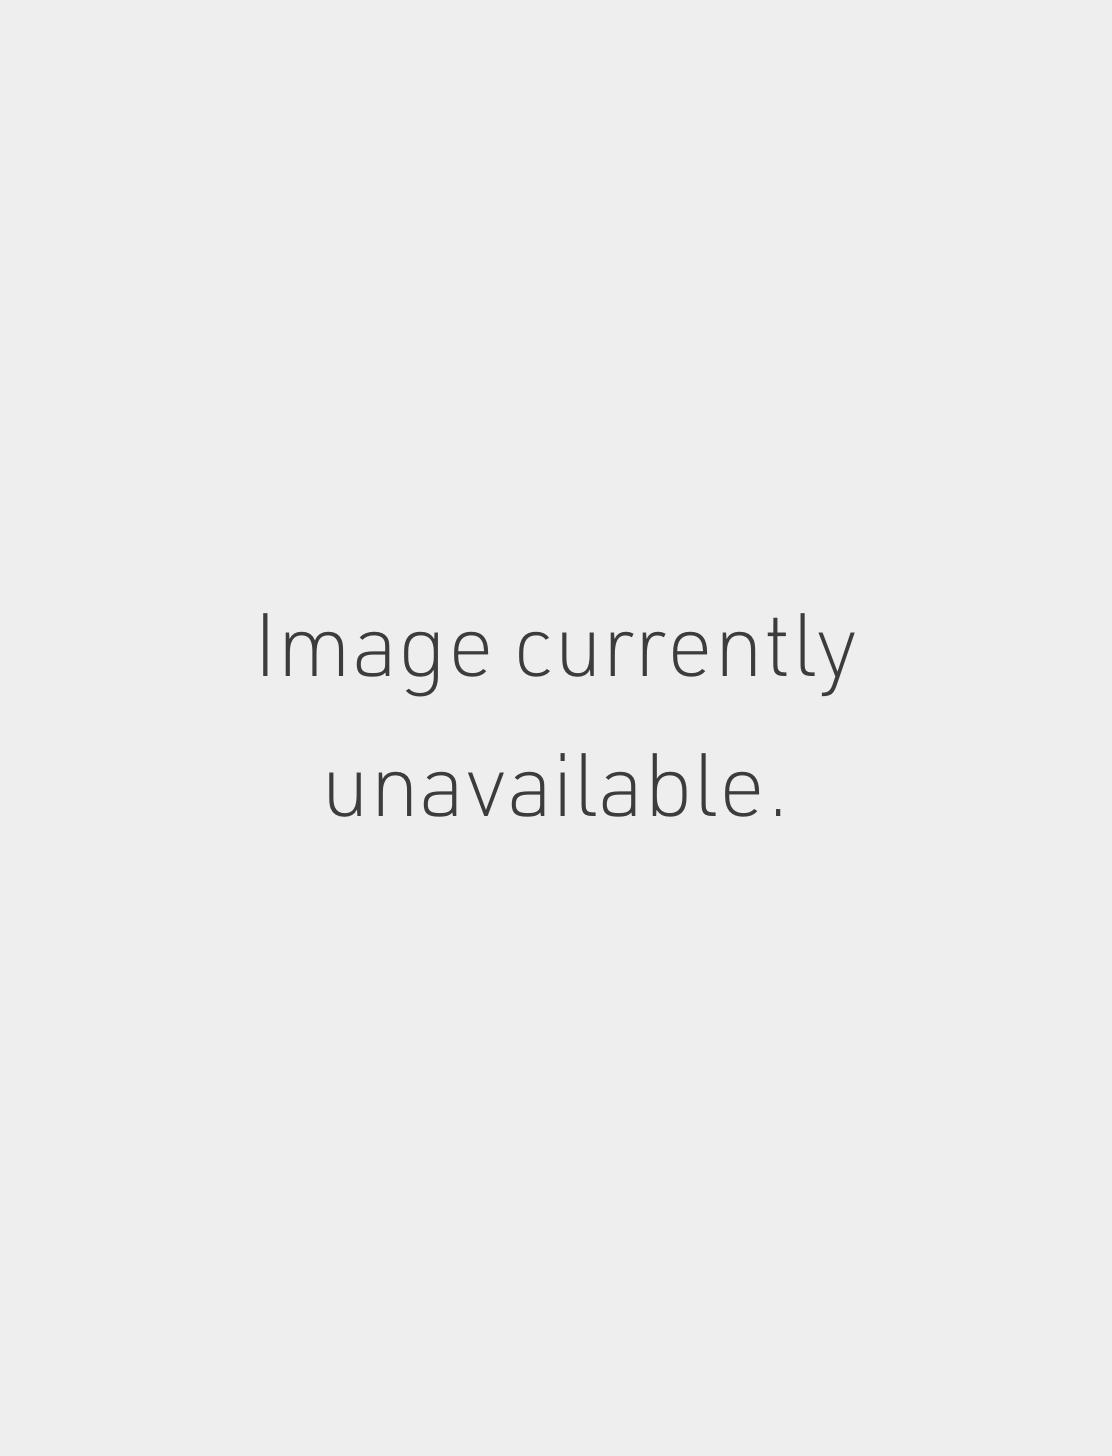 6.5mm Black and White Diamond Pave Ring (Bottom Hinge) Image #1